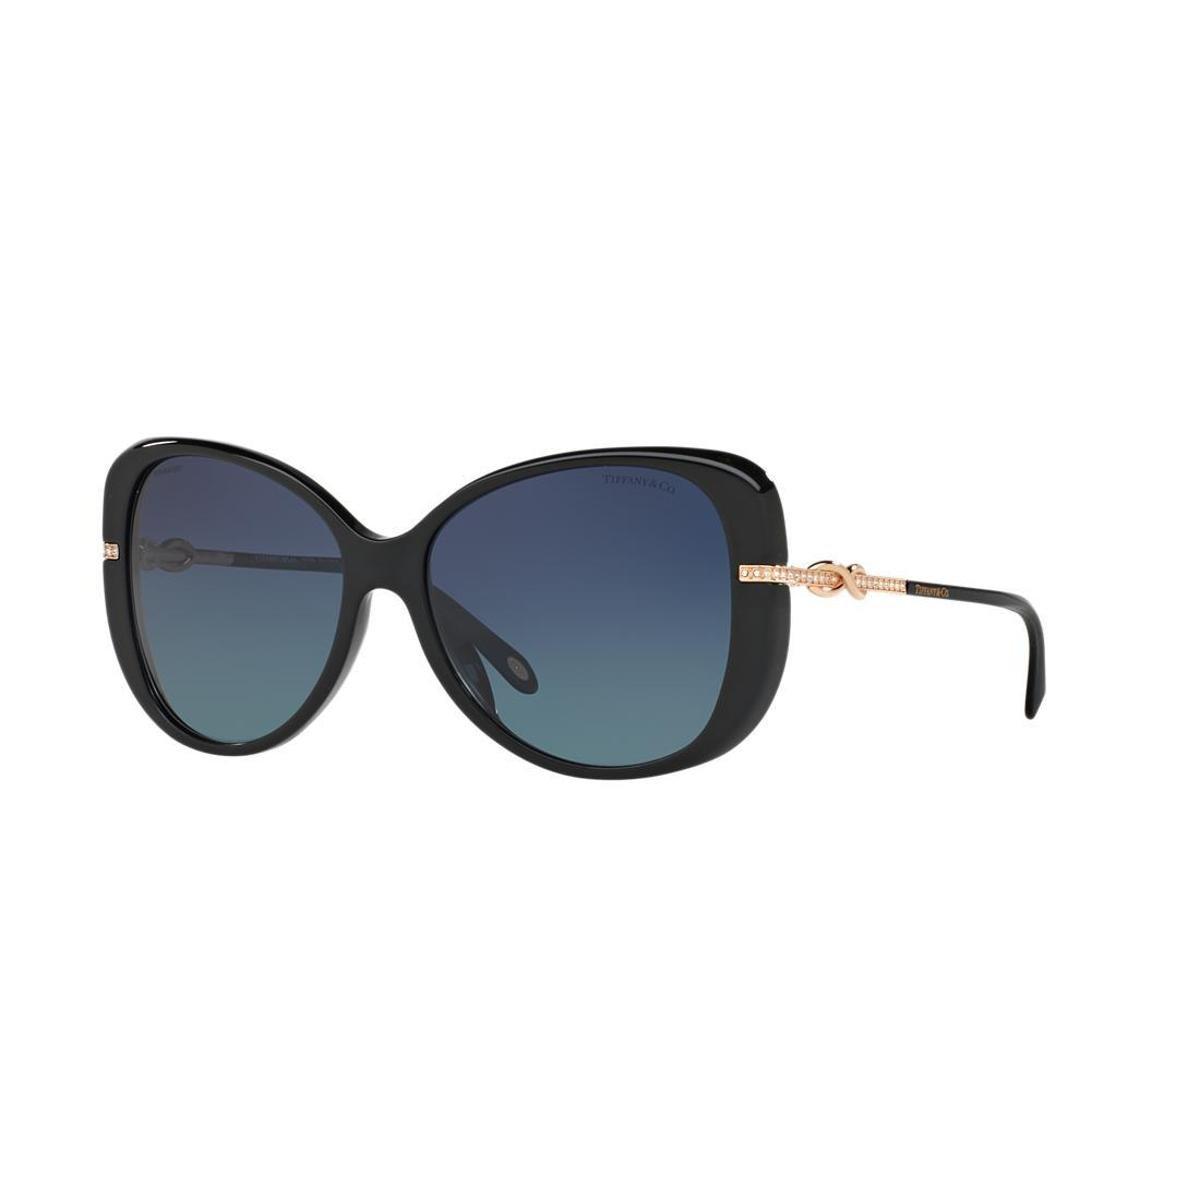 70defaac44388 Óculos de Sol Tiffany   Co. TF4126B - Compre Agora   Zattini